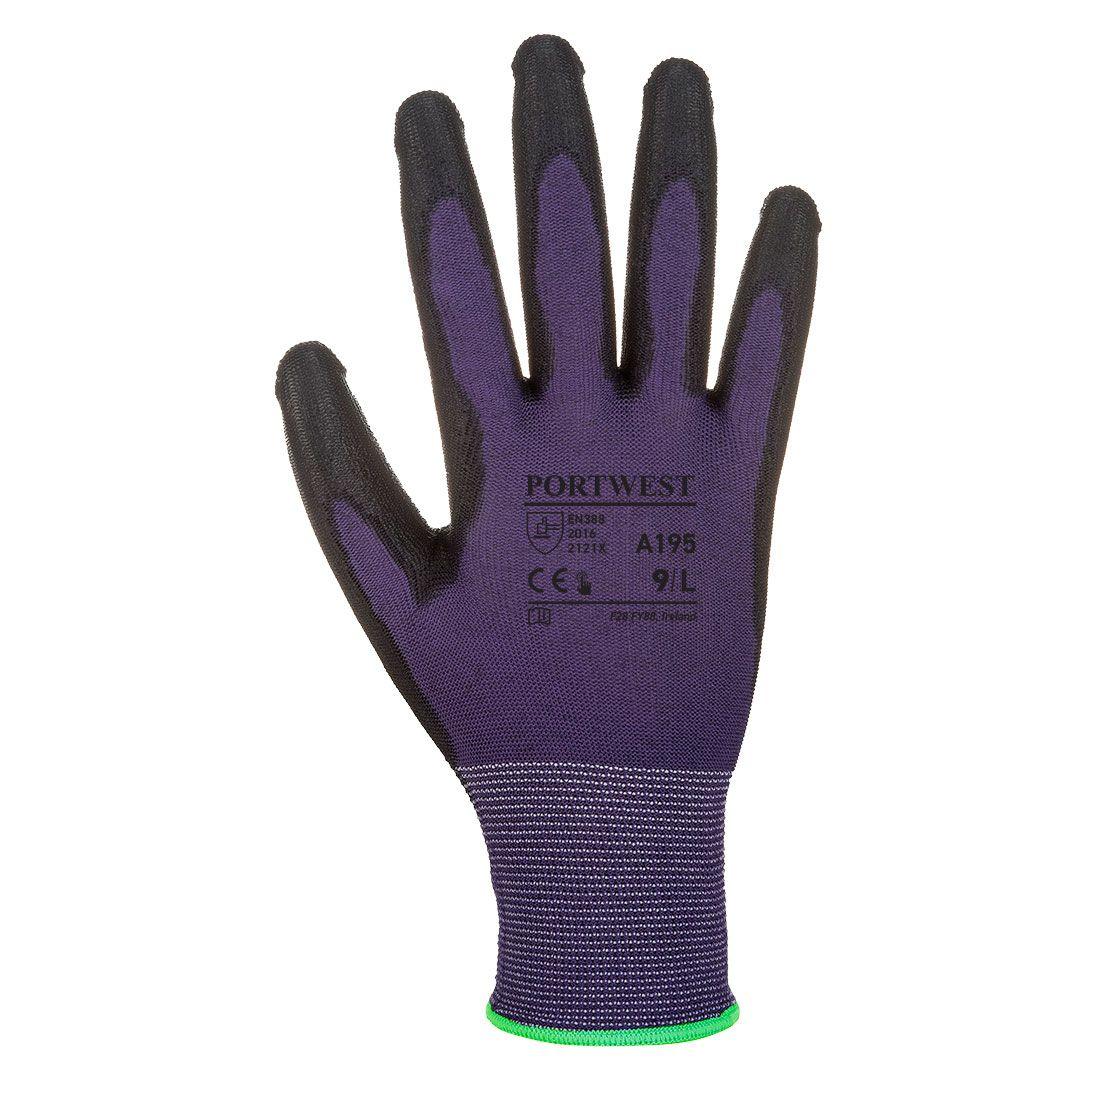 Portwest Handschoenen A195 paars-zwart(U8)